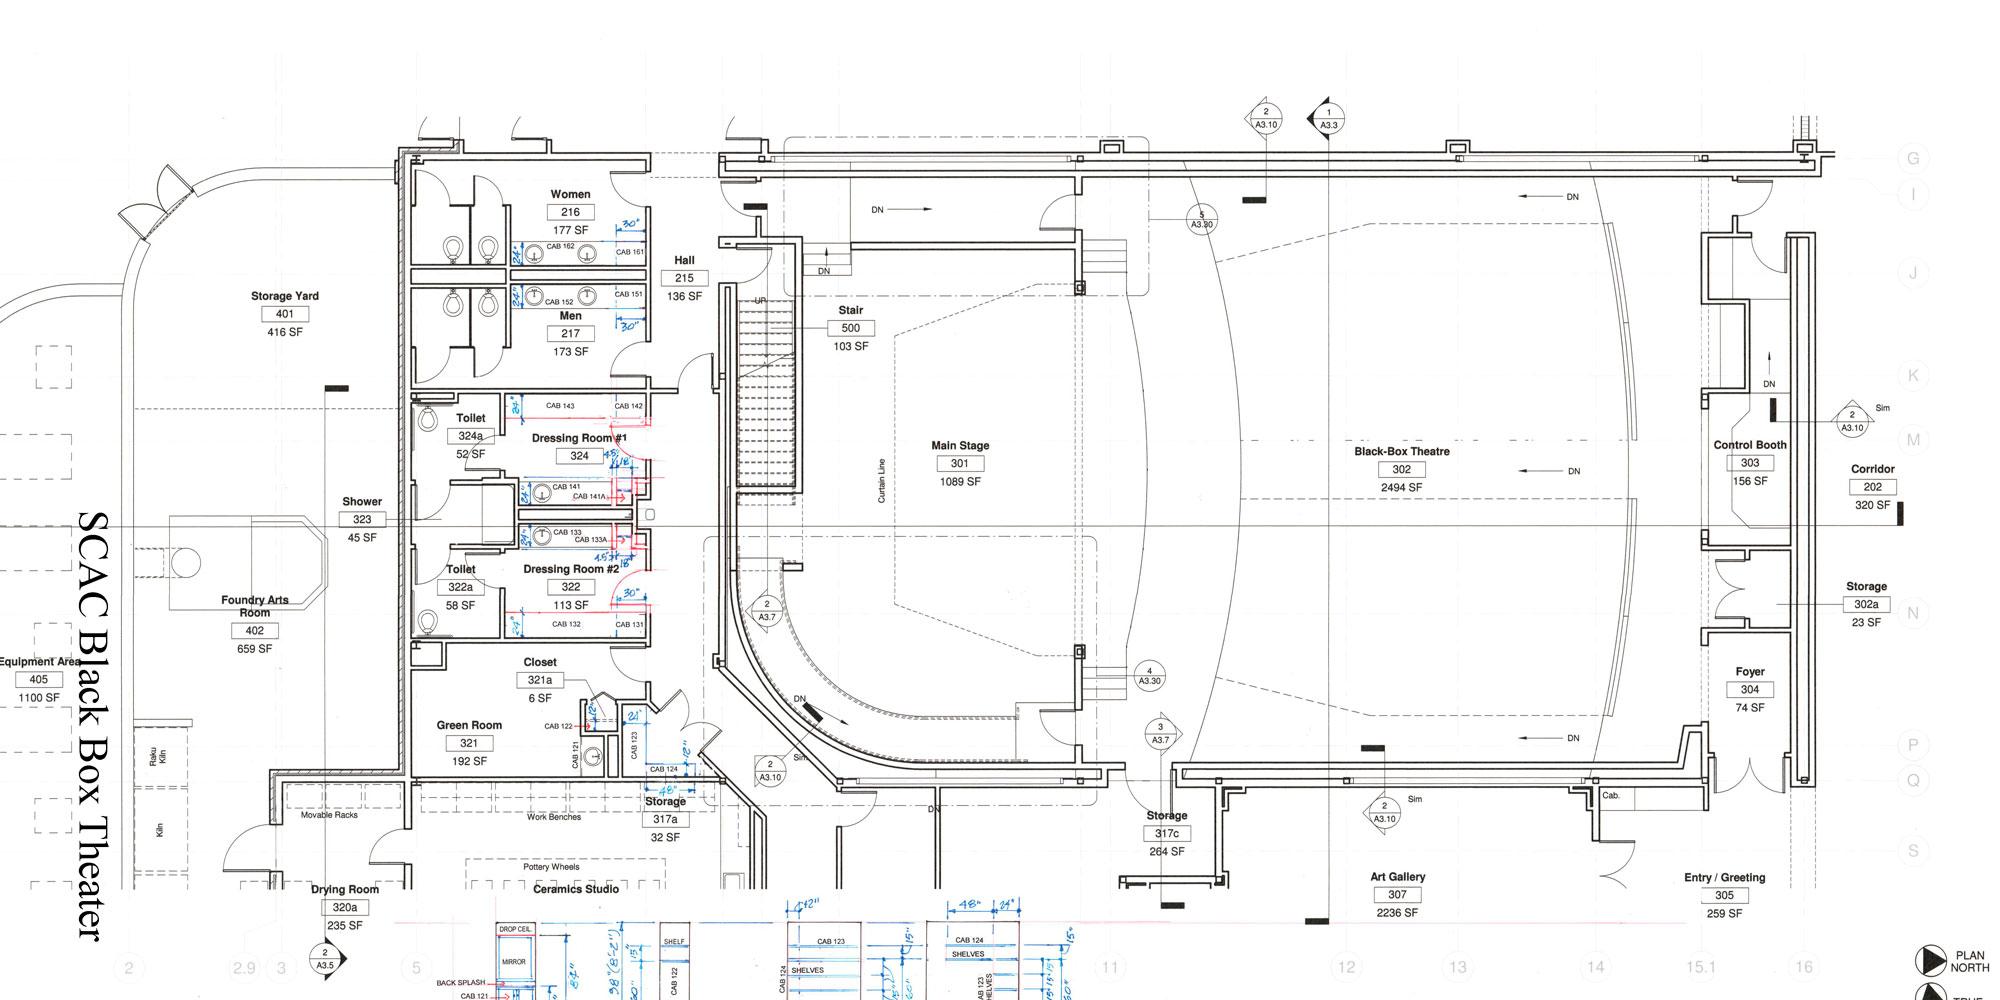 Black Box Theater Floor Plan